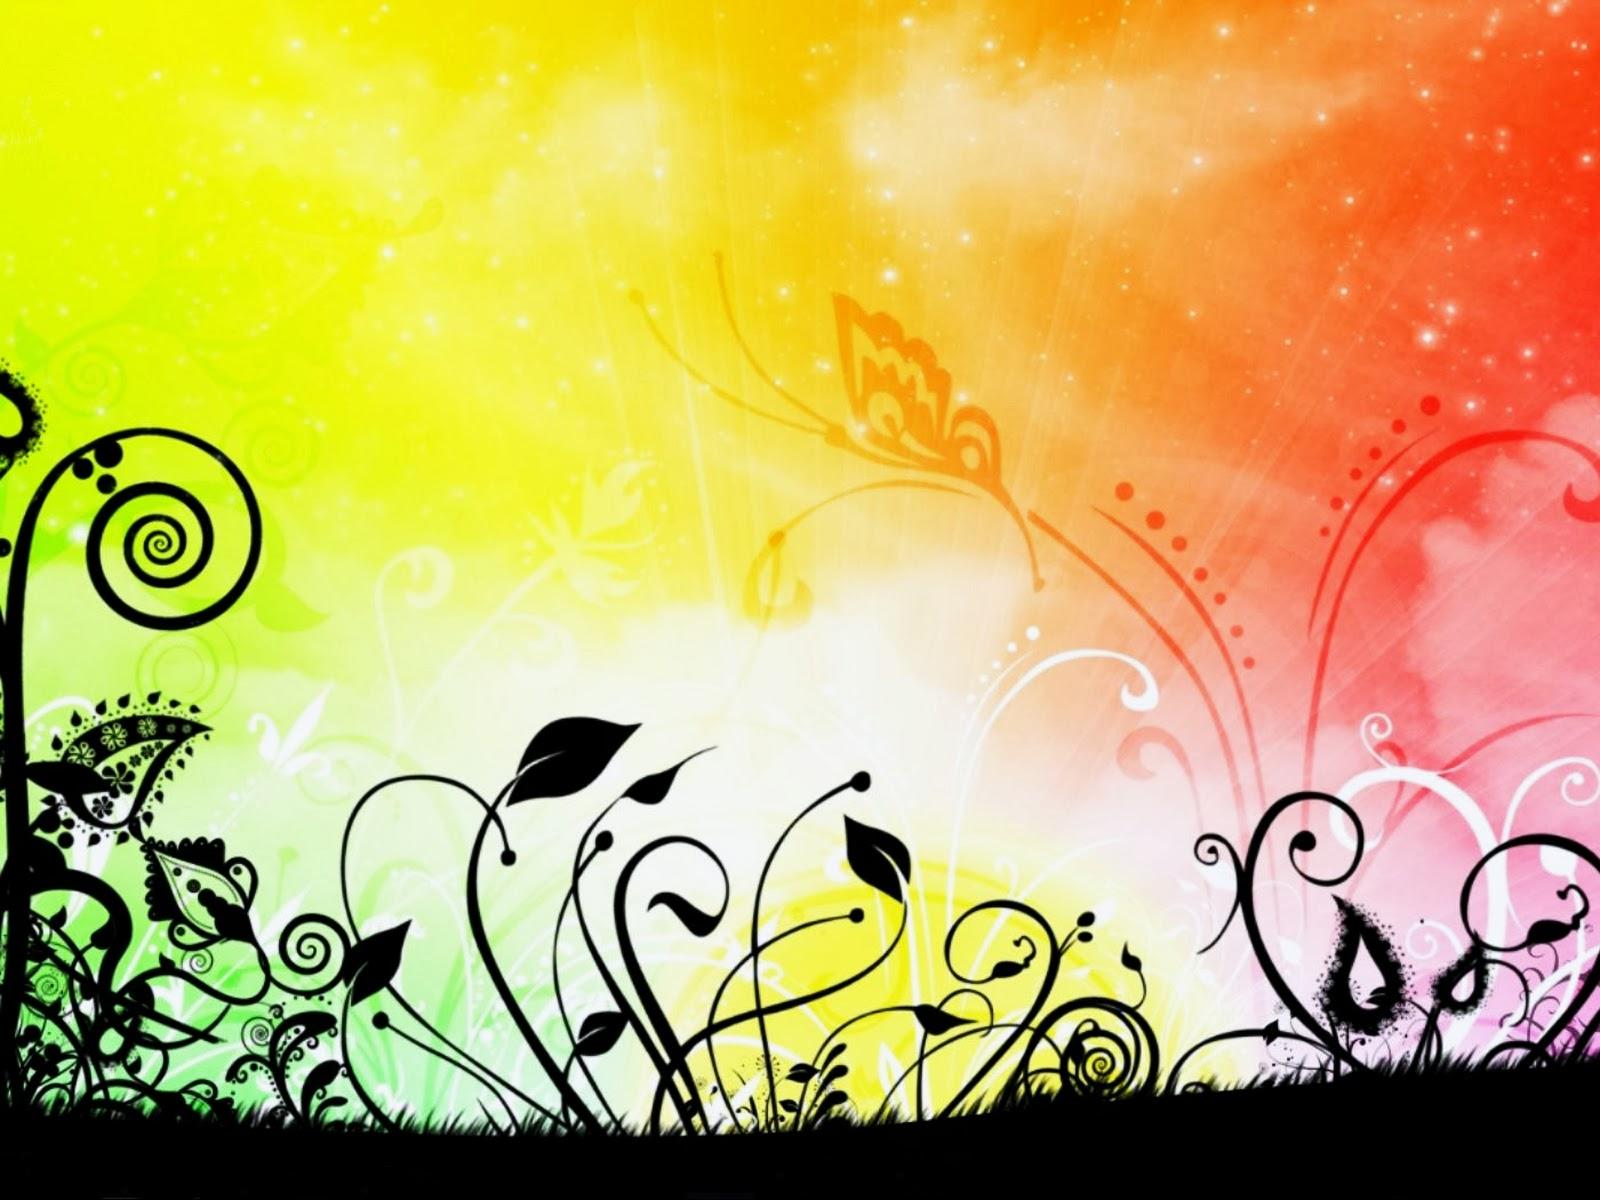 rainbow flower background - photo #29